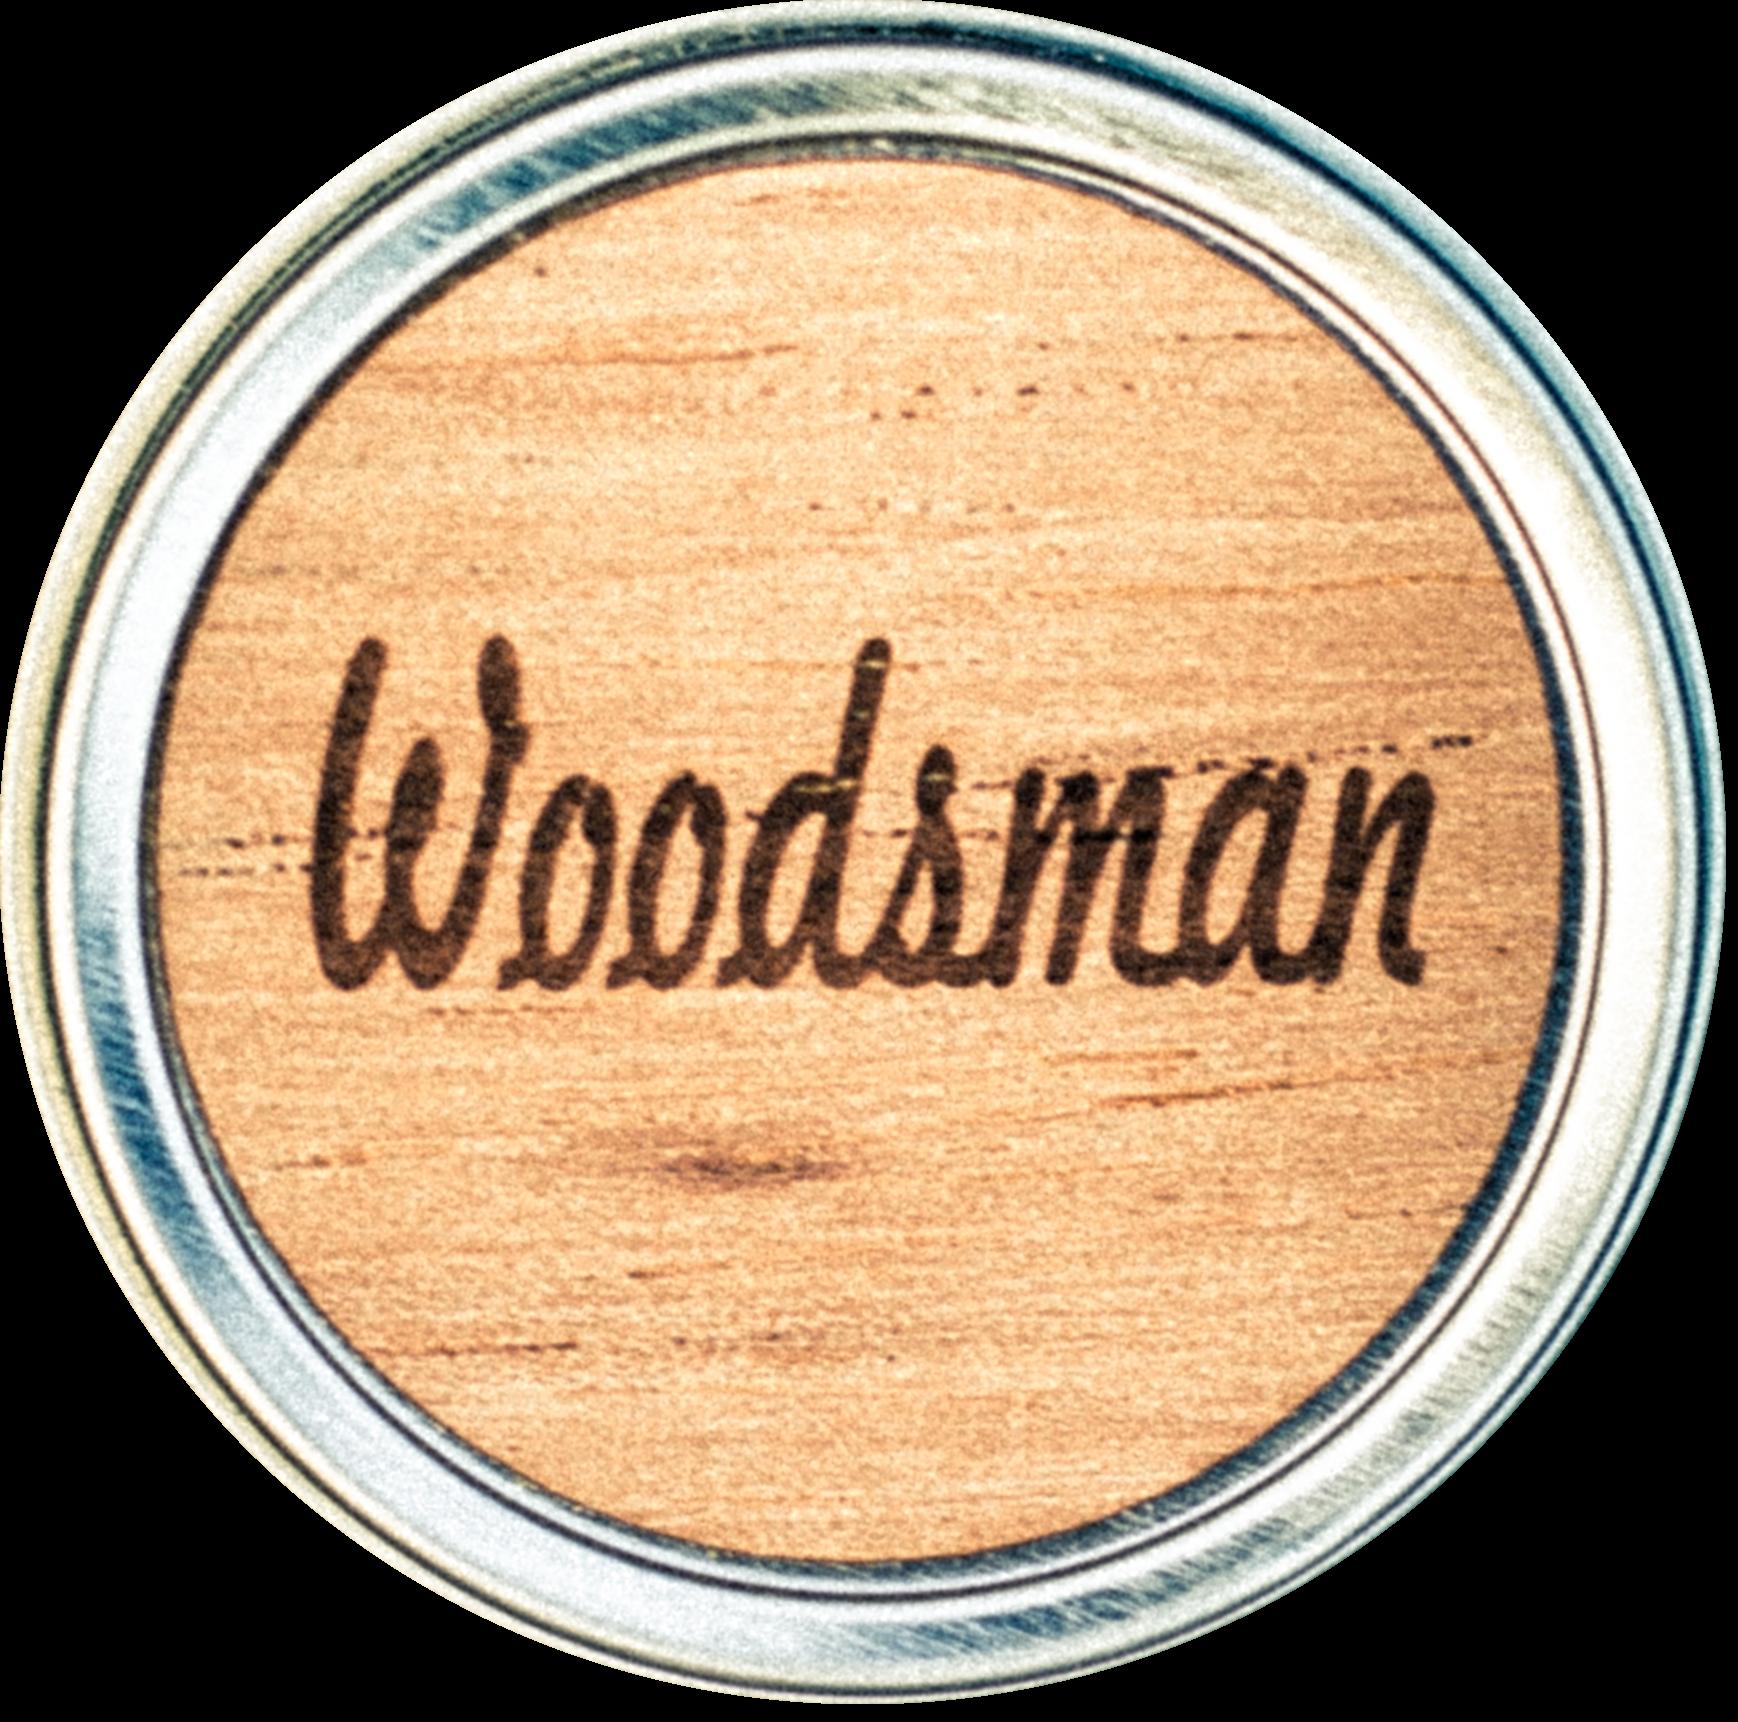 woodsmenlogo